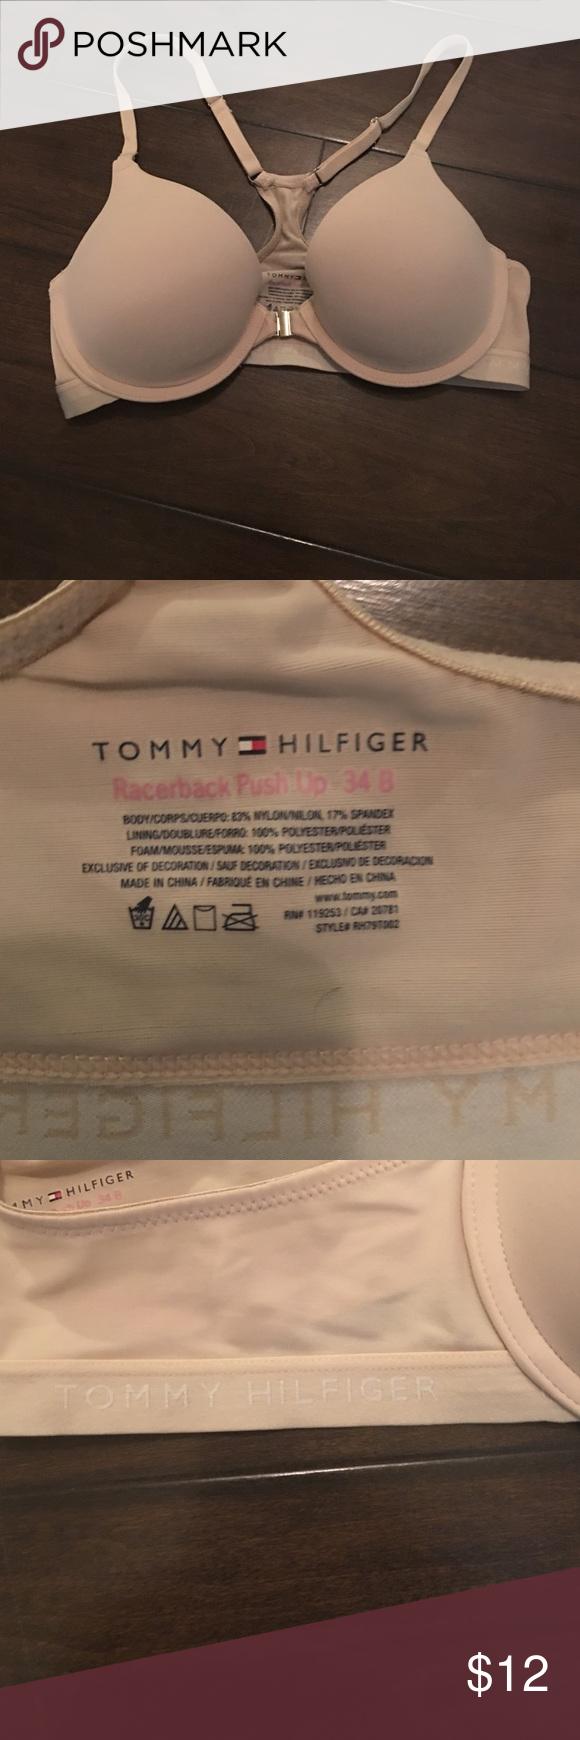 Tommy Hilfiger racer back push up bra Front close racer back push up bra size 34B in nude Tommy Hilfiger Intimates & Sleepwear Bras